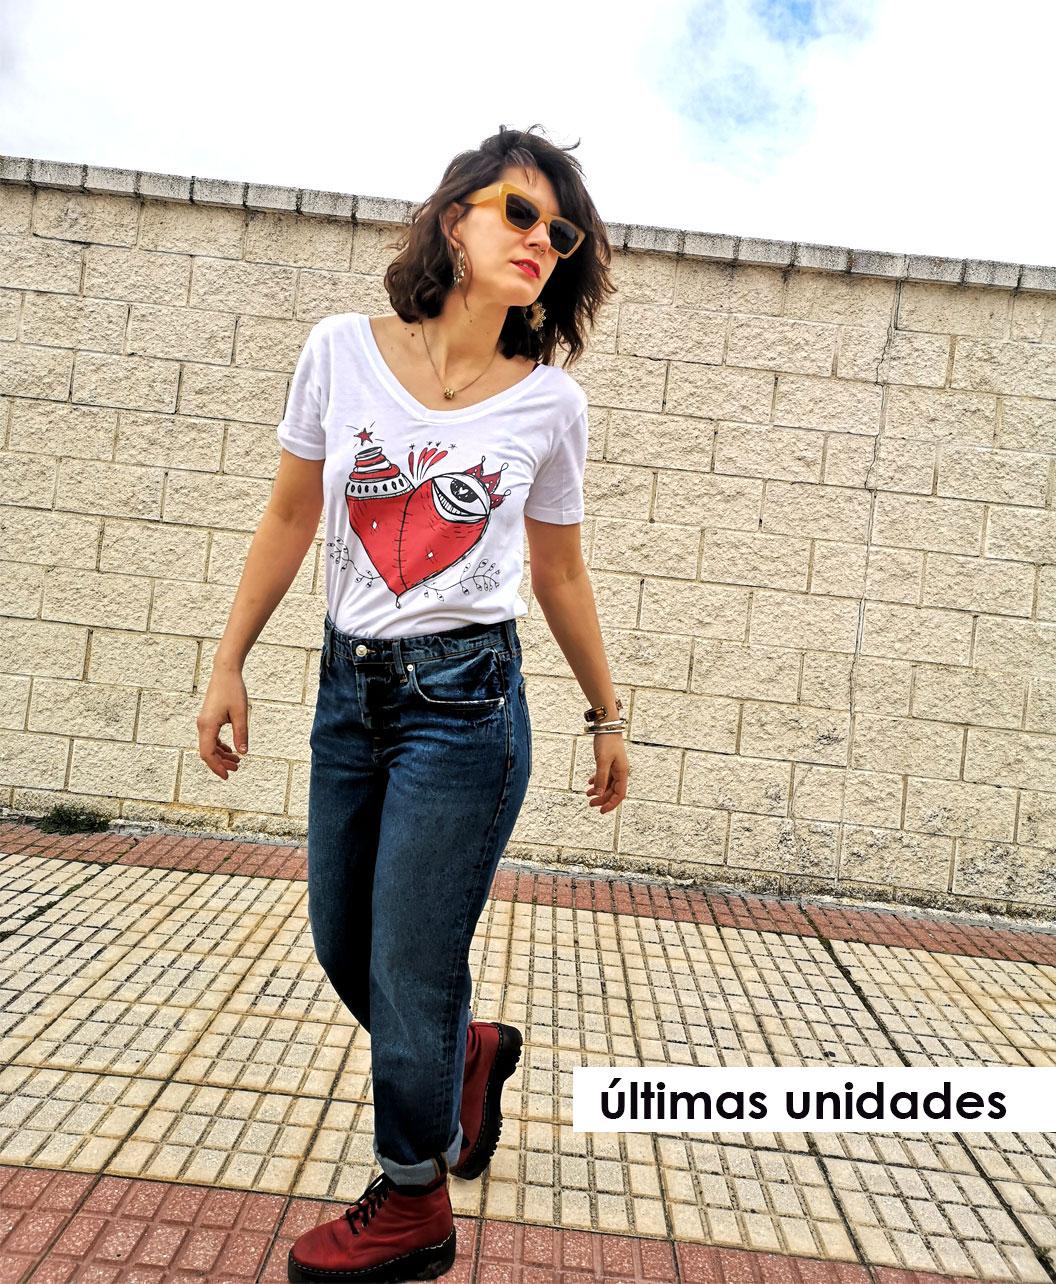 camiseta mujer algodon organico original diferente ilustracion corazon malherido